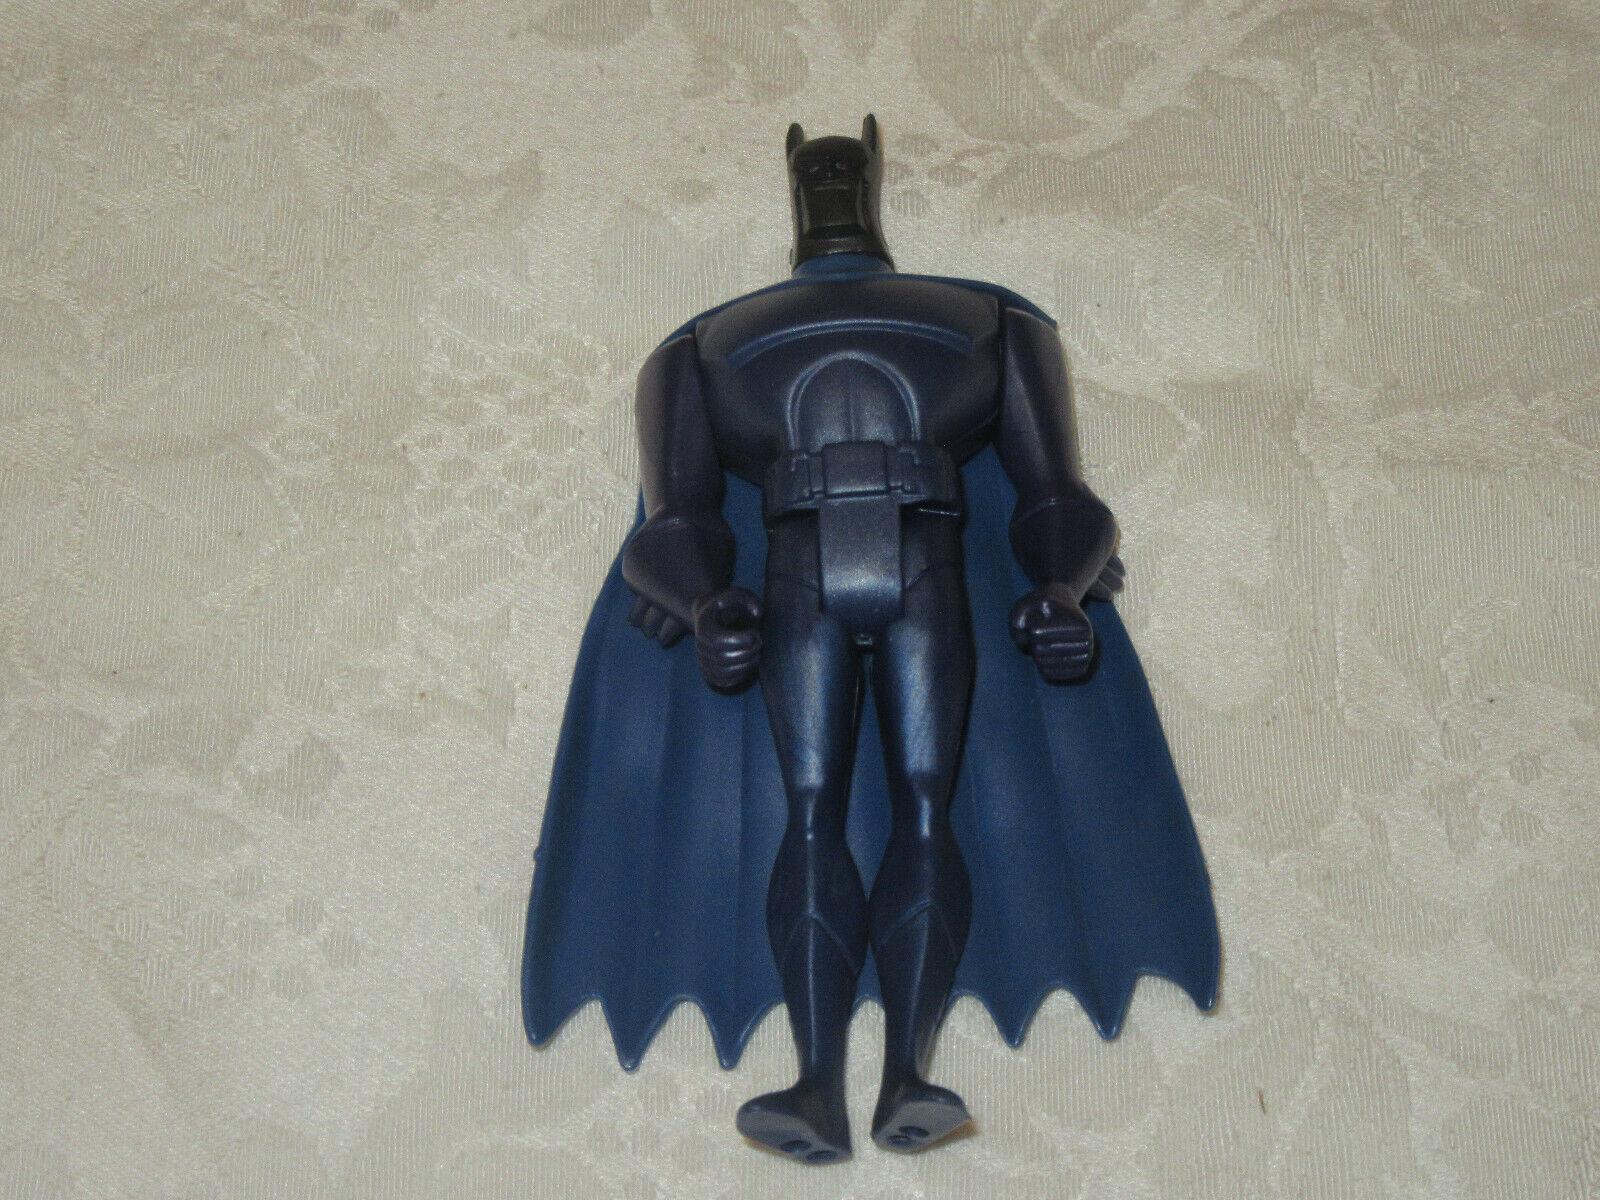 Mattel DC Universe Justice League Unimited 4  projootipo de prueba de disparo Batman